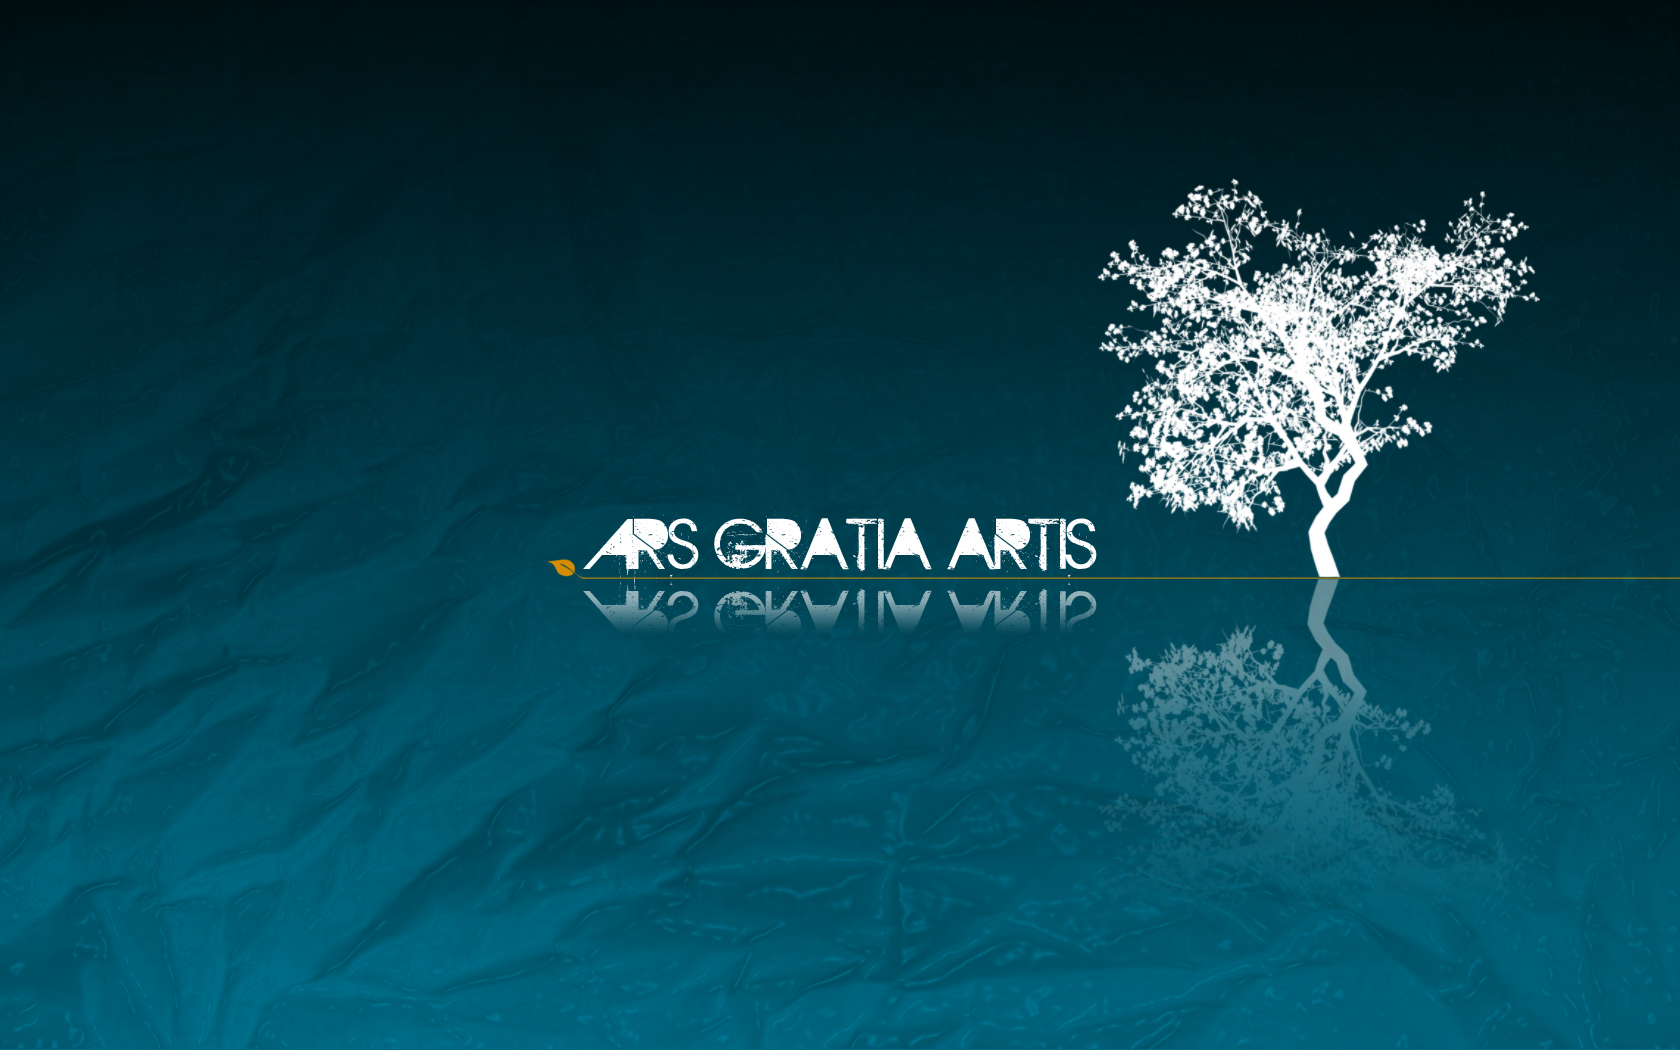 gratia artis gallery. Black Bedroom Furniture Sets. Home Design Ideas